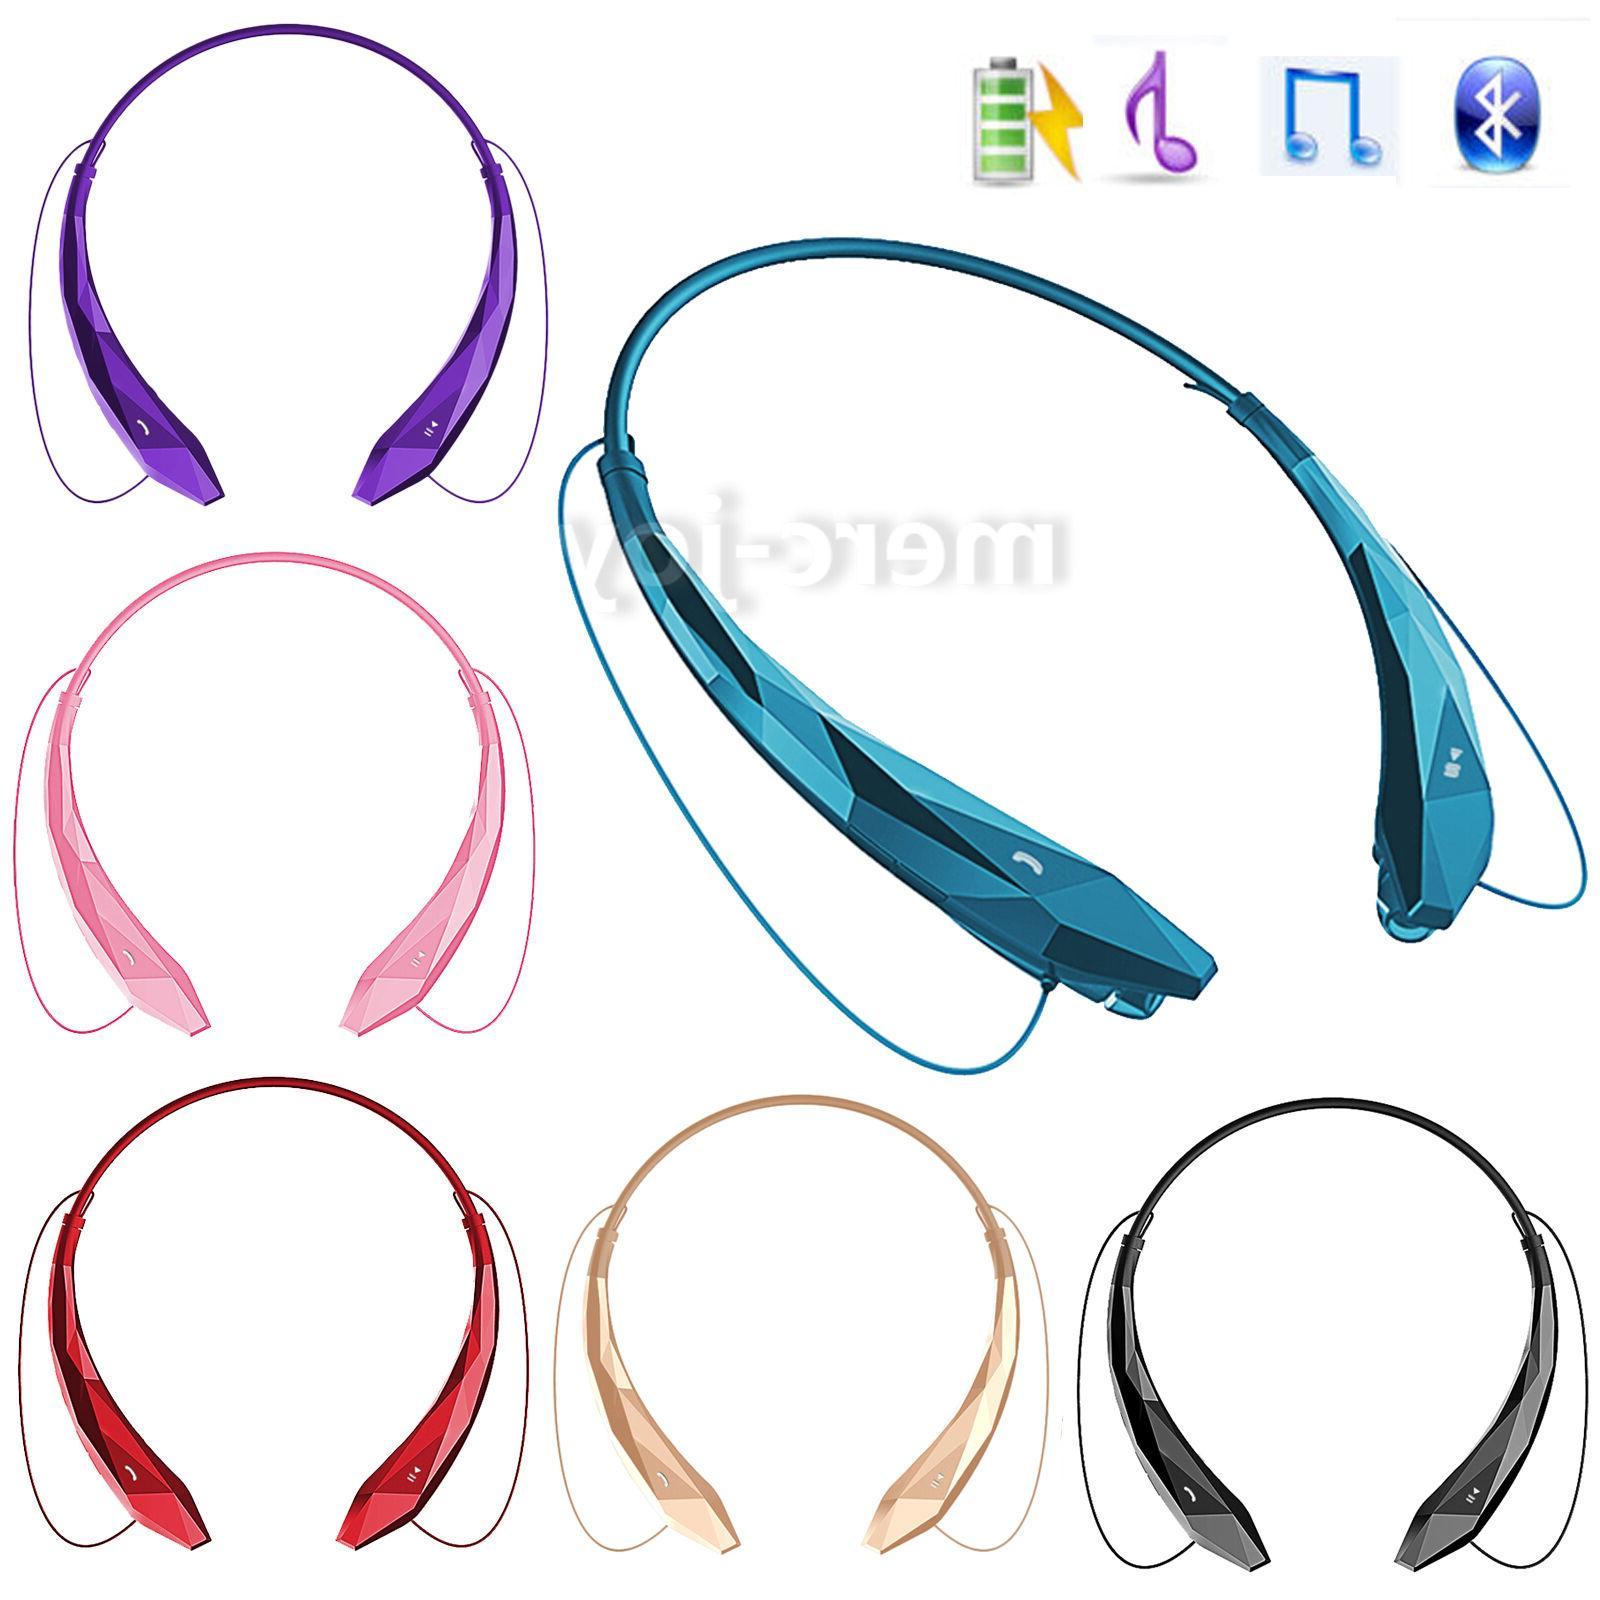 bluetooth wireless stereo headset earbuds headphones earphon